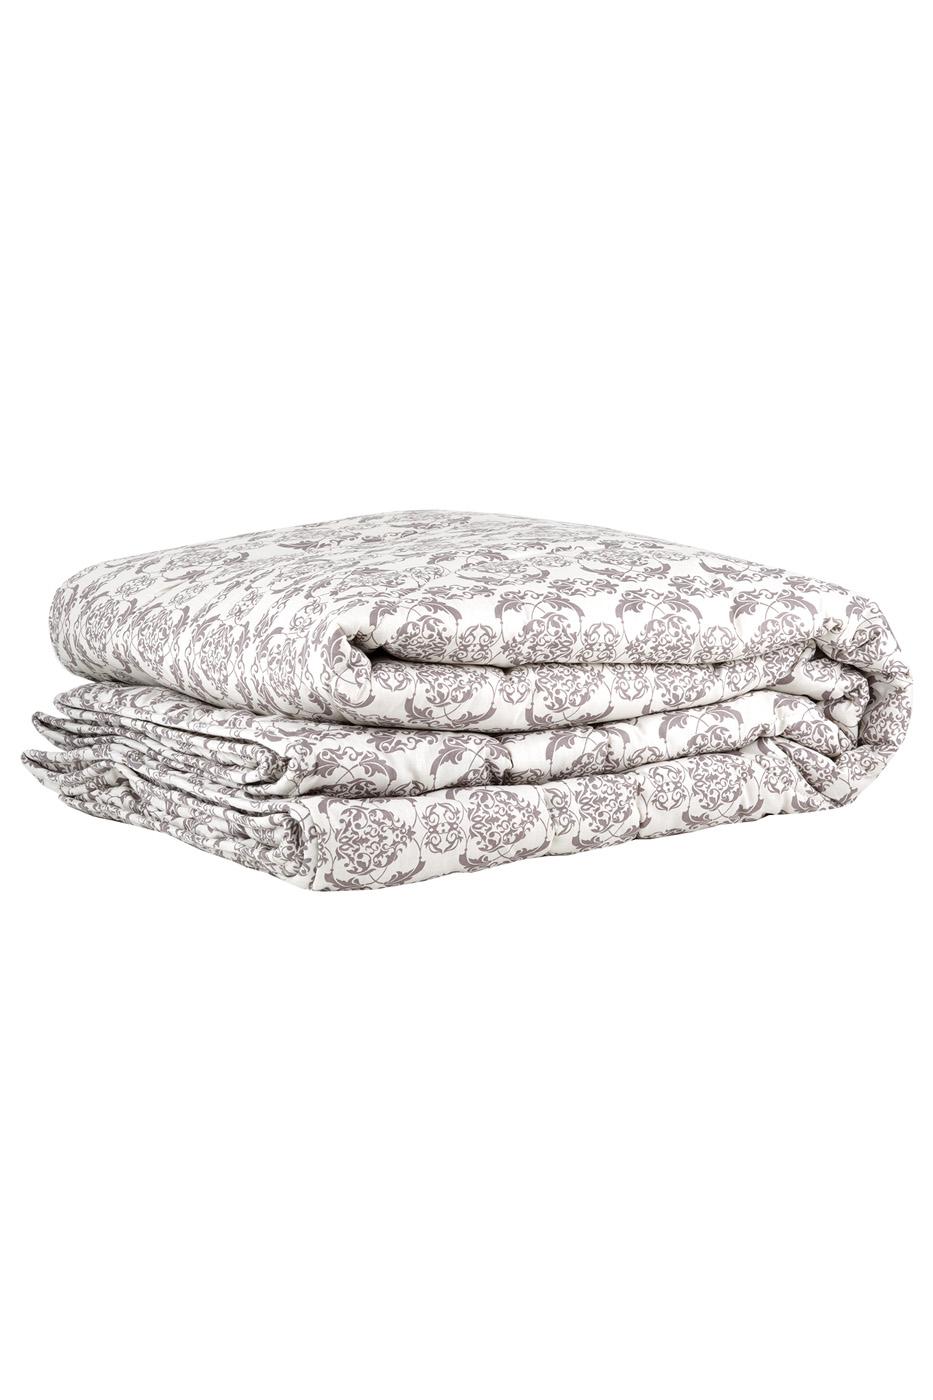 Одеяла CLASSIC by T Одеяло Софт Премиум Теплое (200х210 см) одеяло classic by t верблюжья шерсть